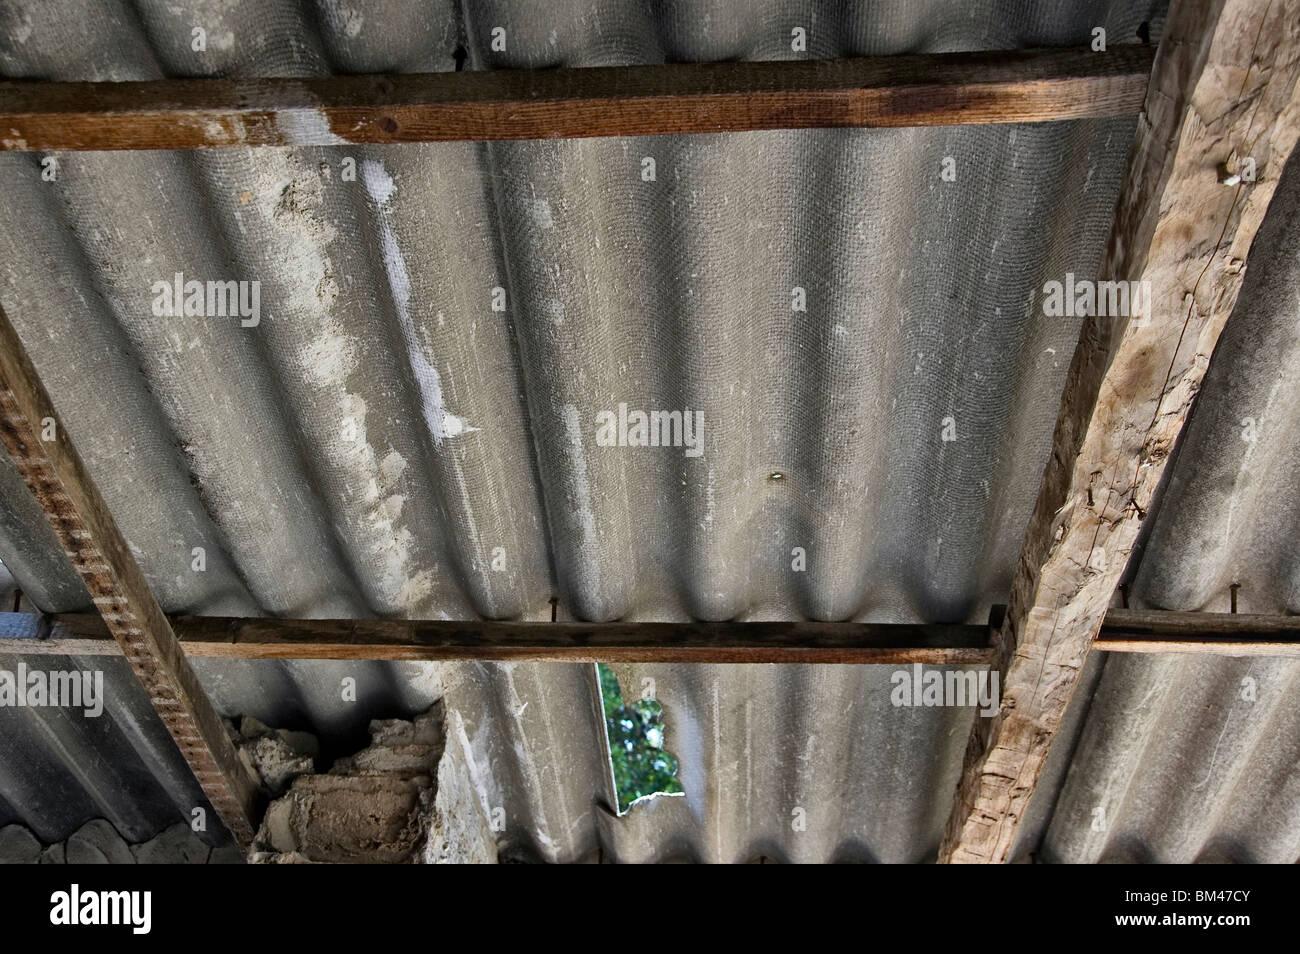 Broken asbestos roofing inside an abandoned house. Hazardous material. - Stock Image